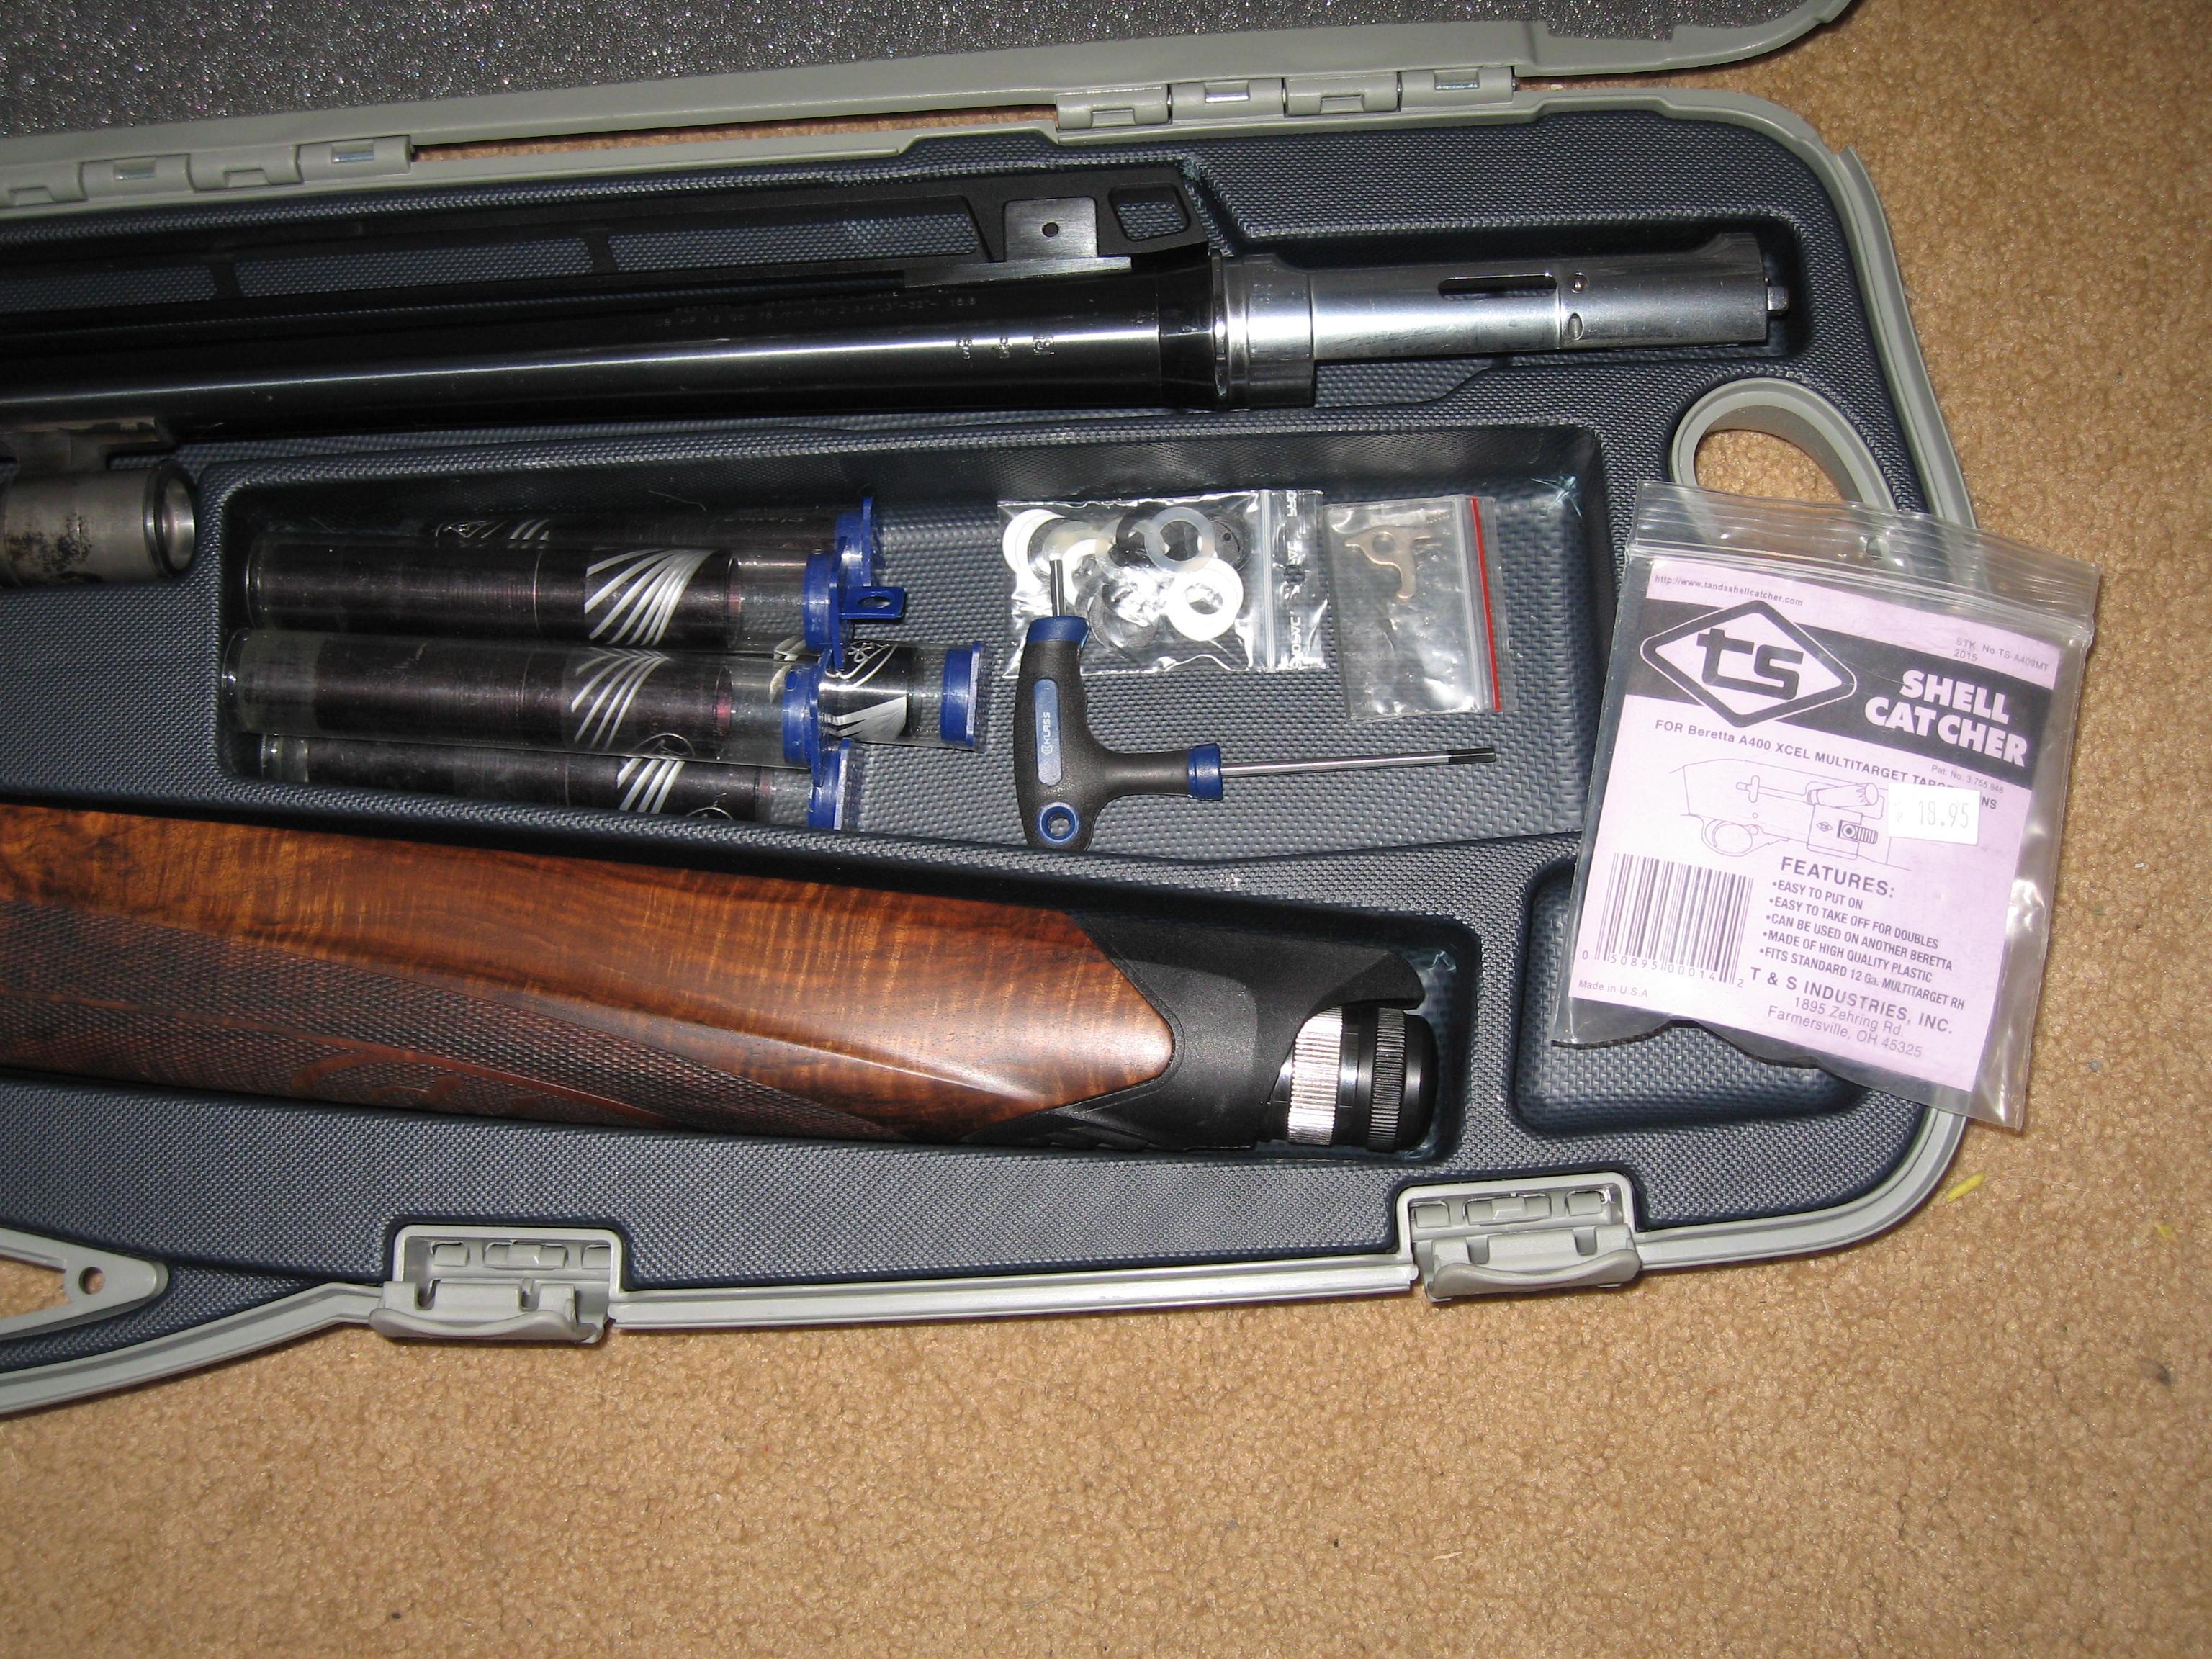 Sold - Beretta 400 Multitarget 32